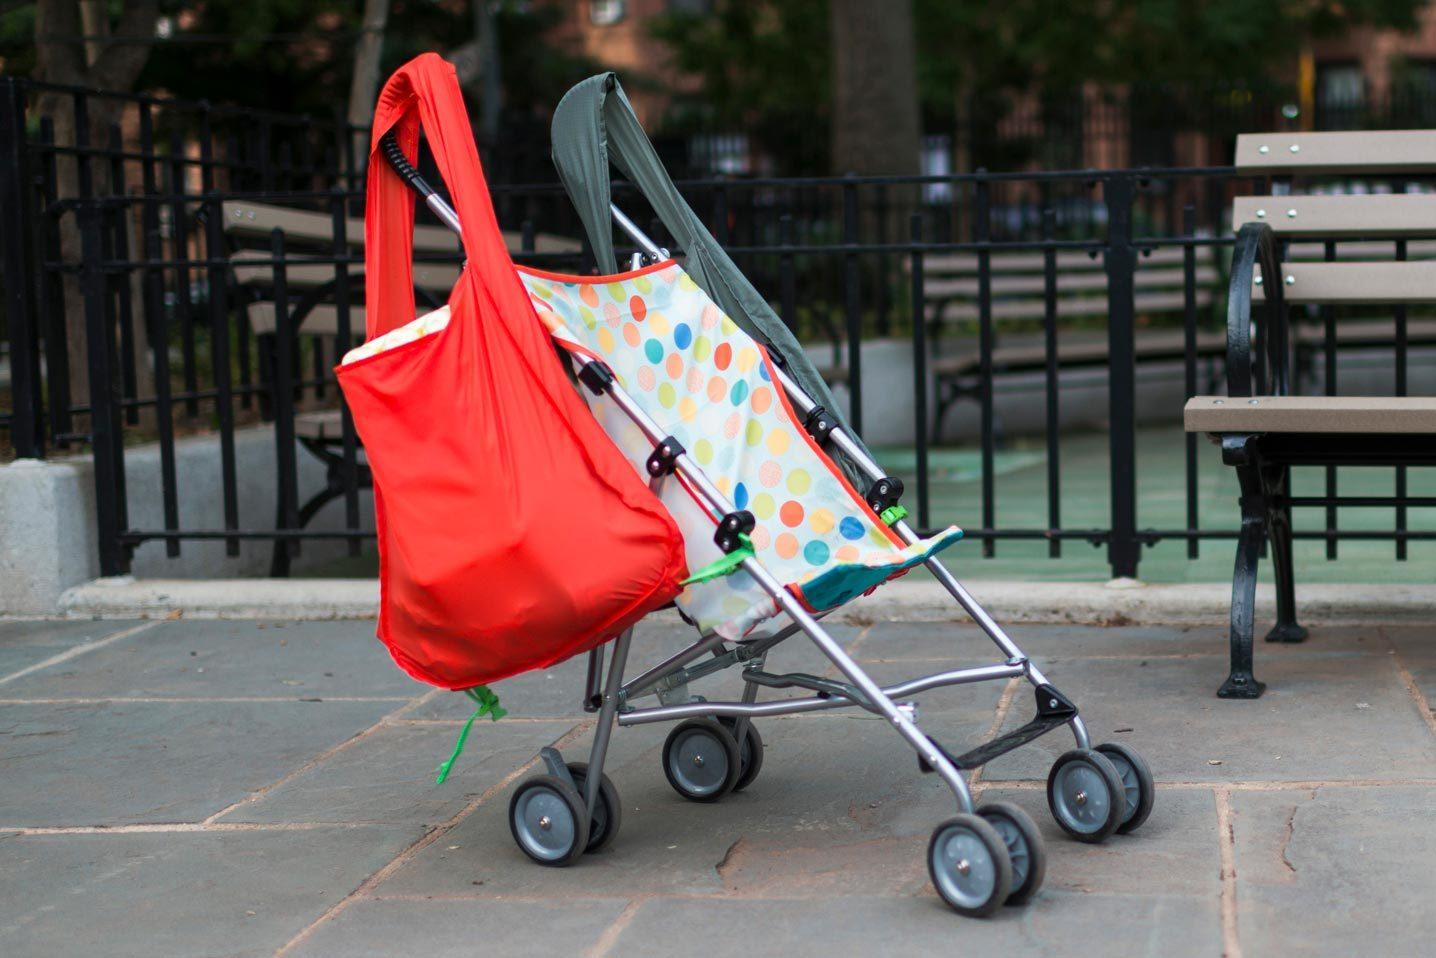 sureshop bags on stroller handles